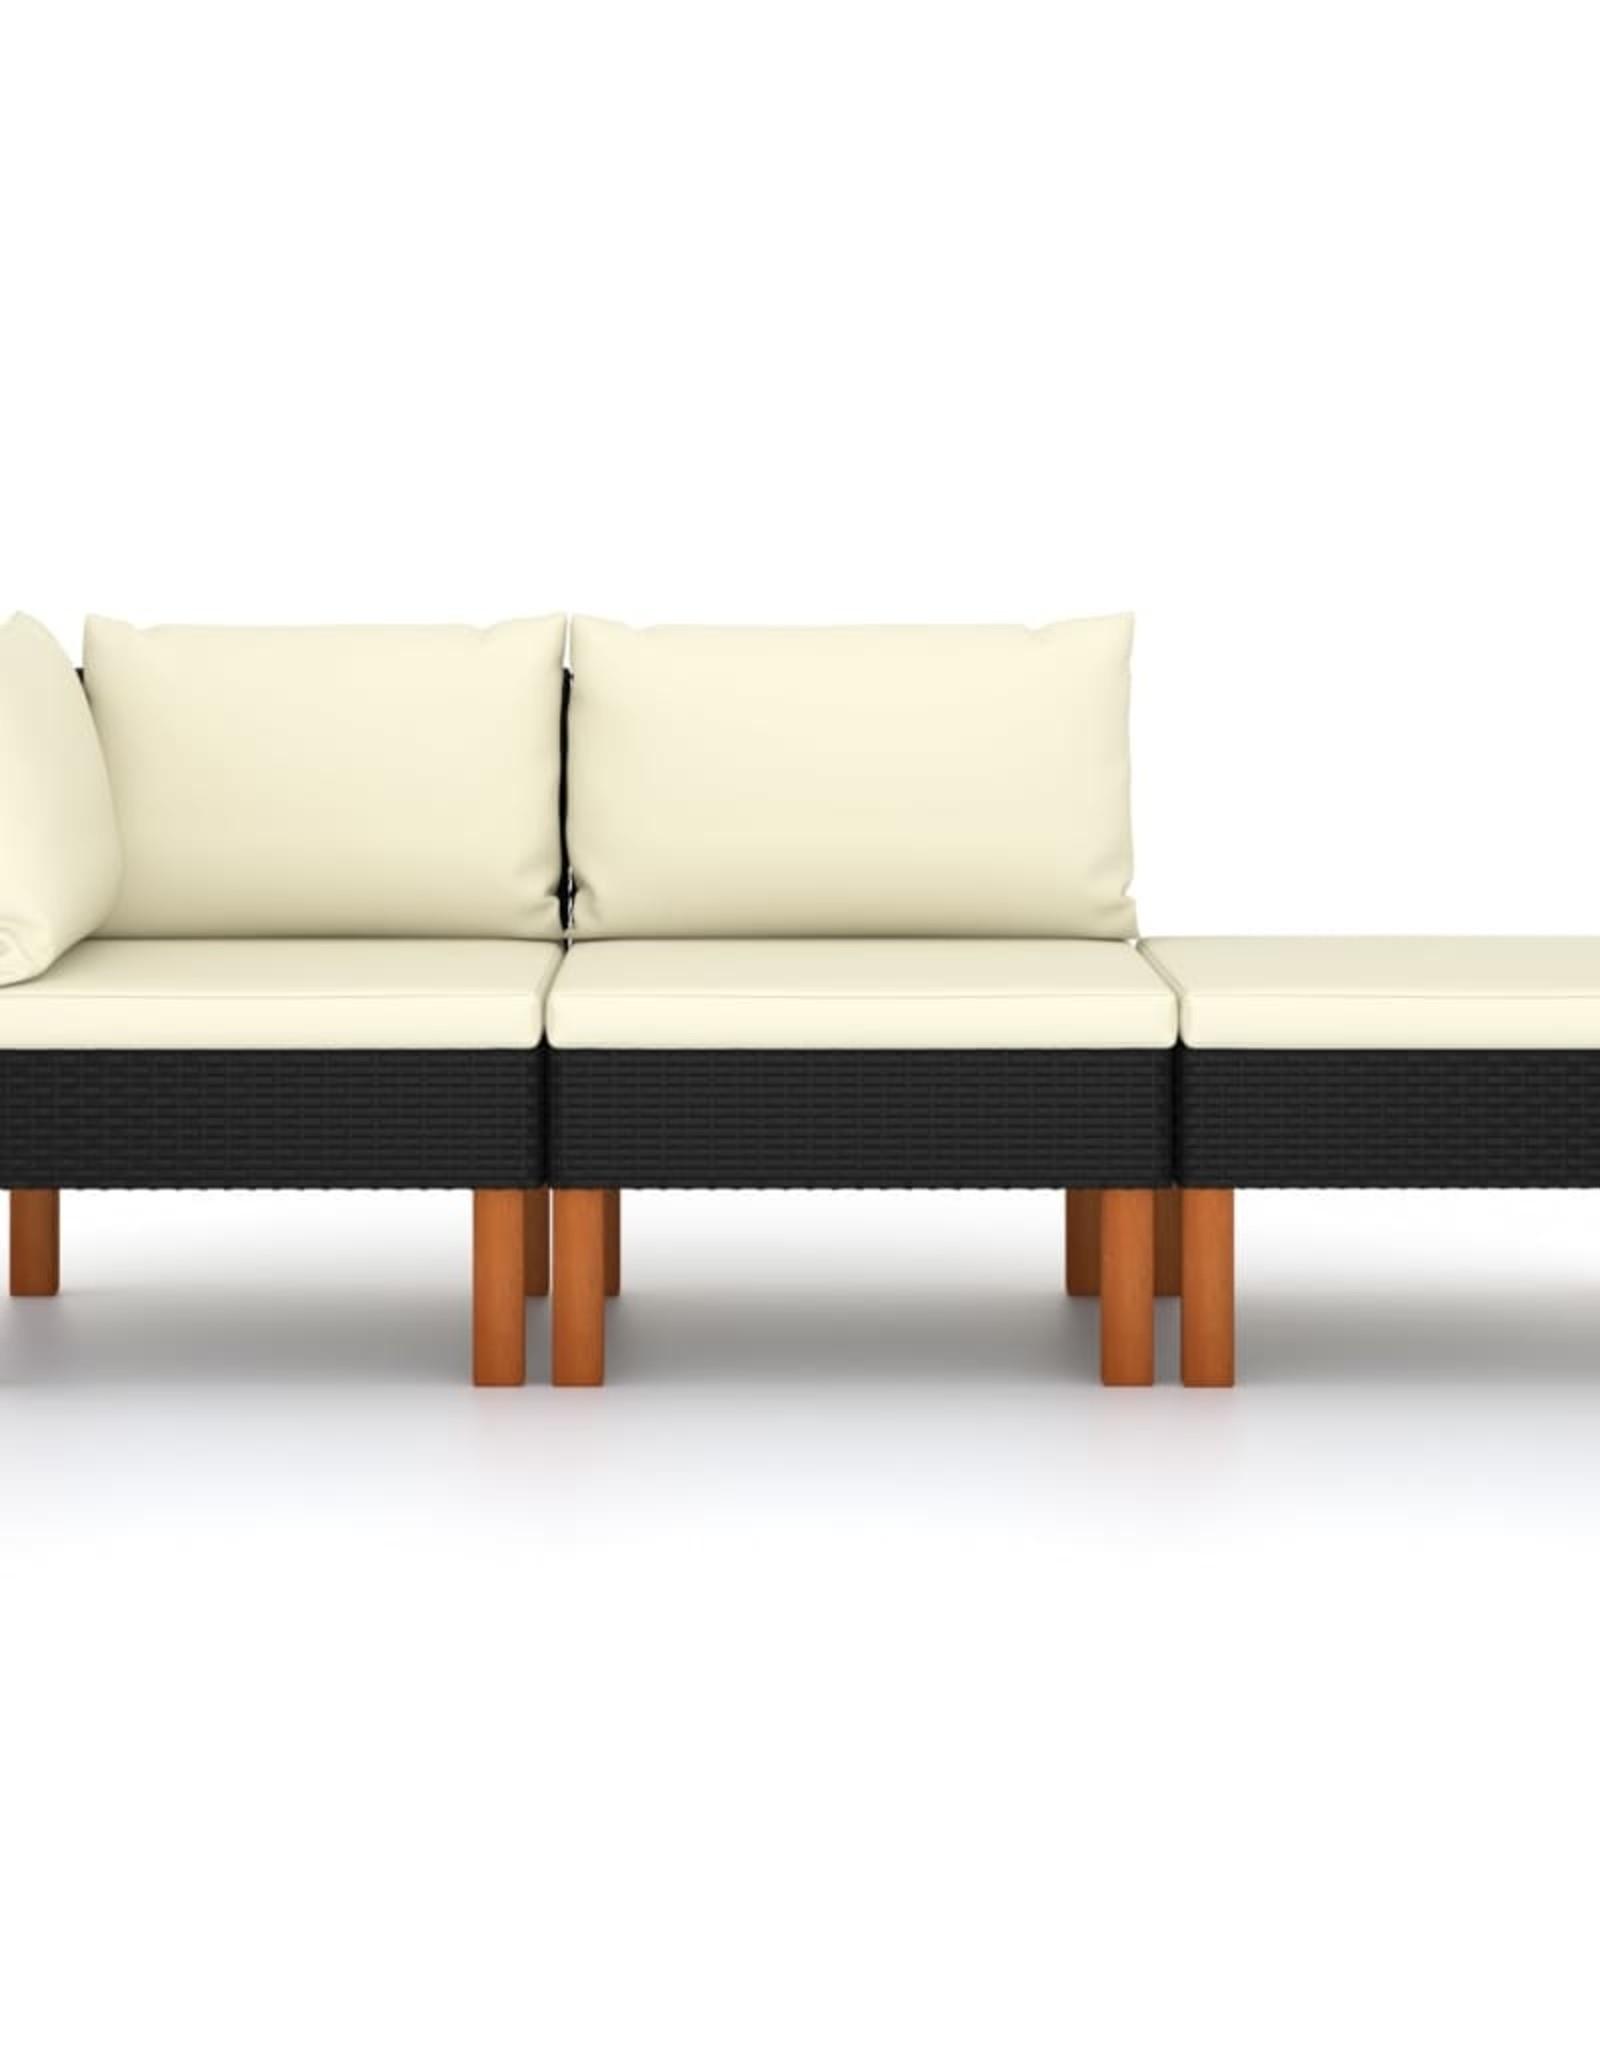 3-delige Loungeset poly rattan en massief eucalyptushout